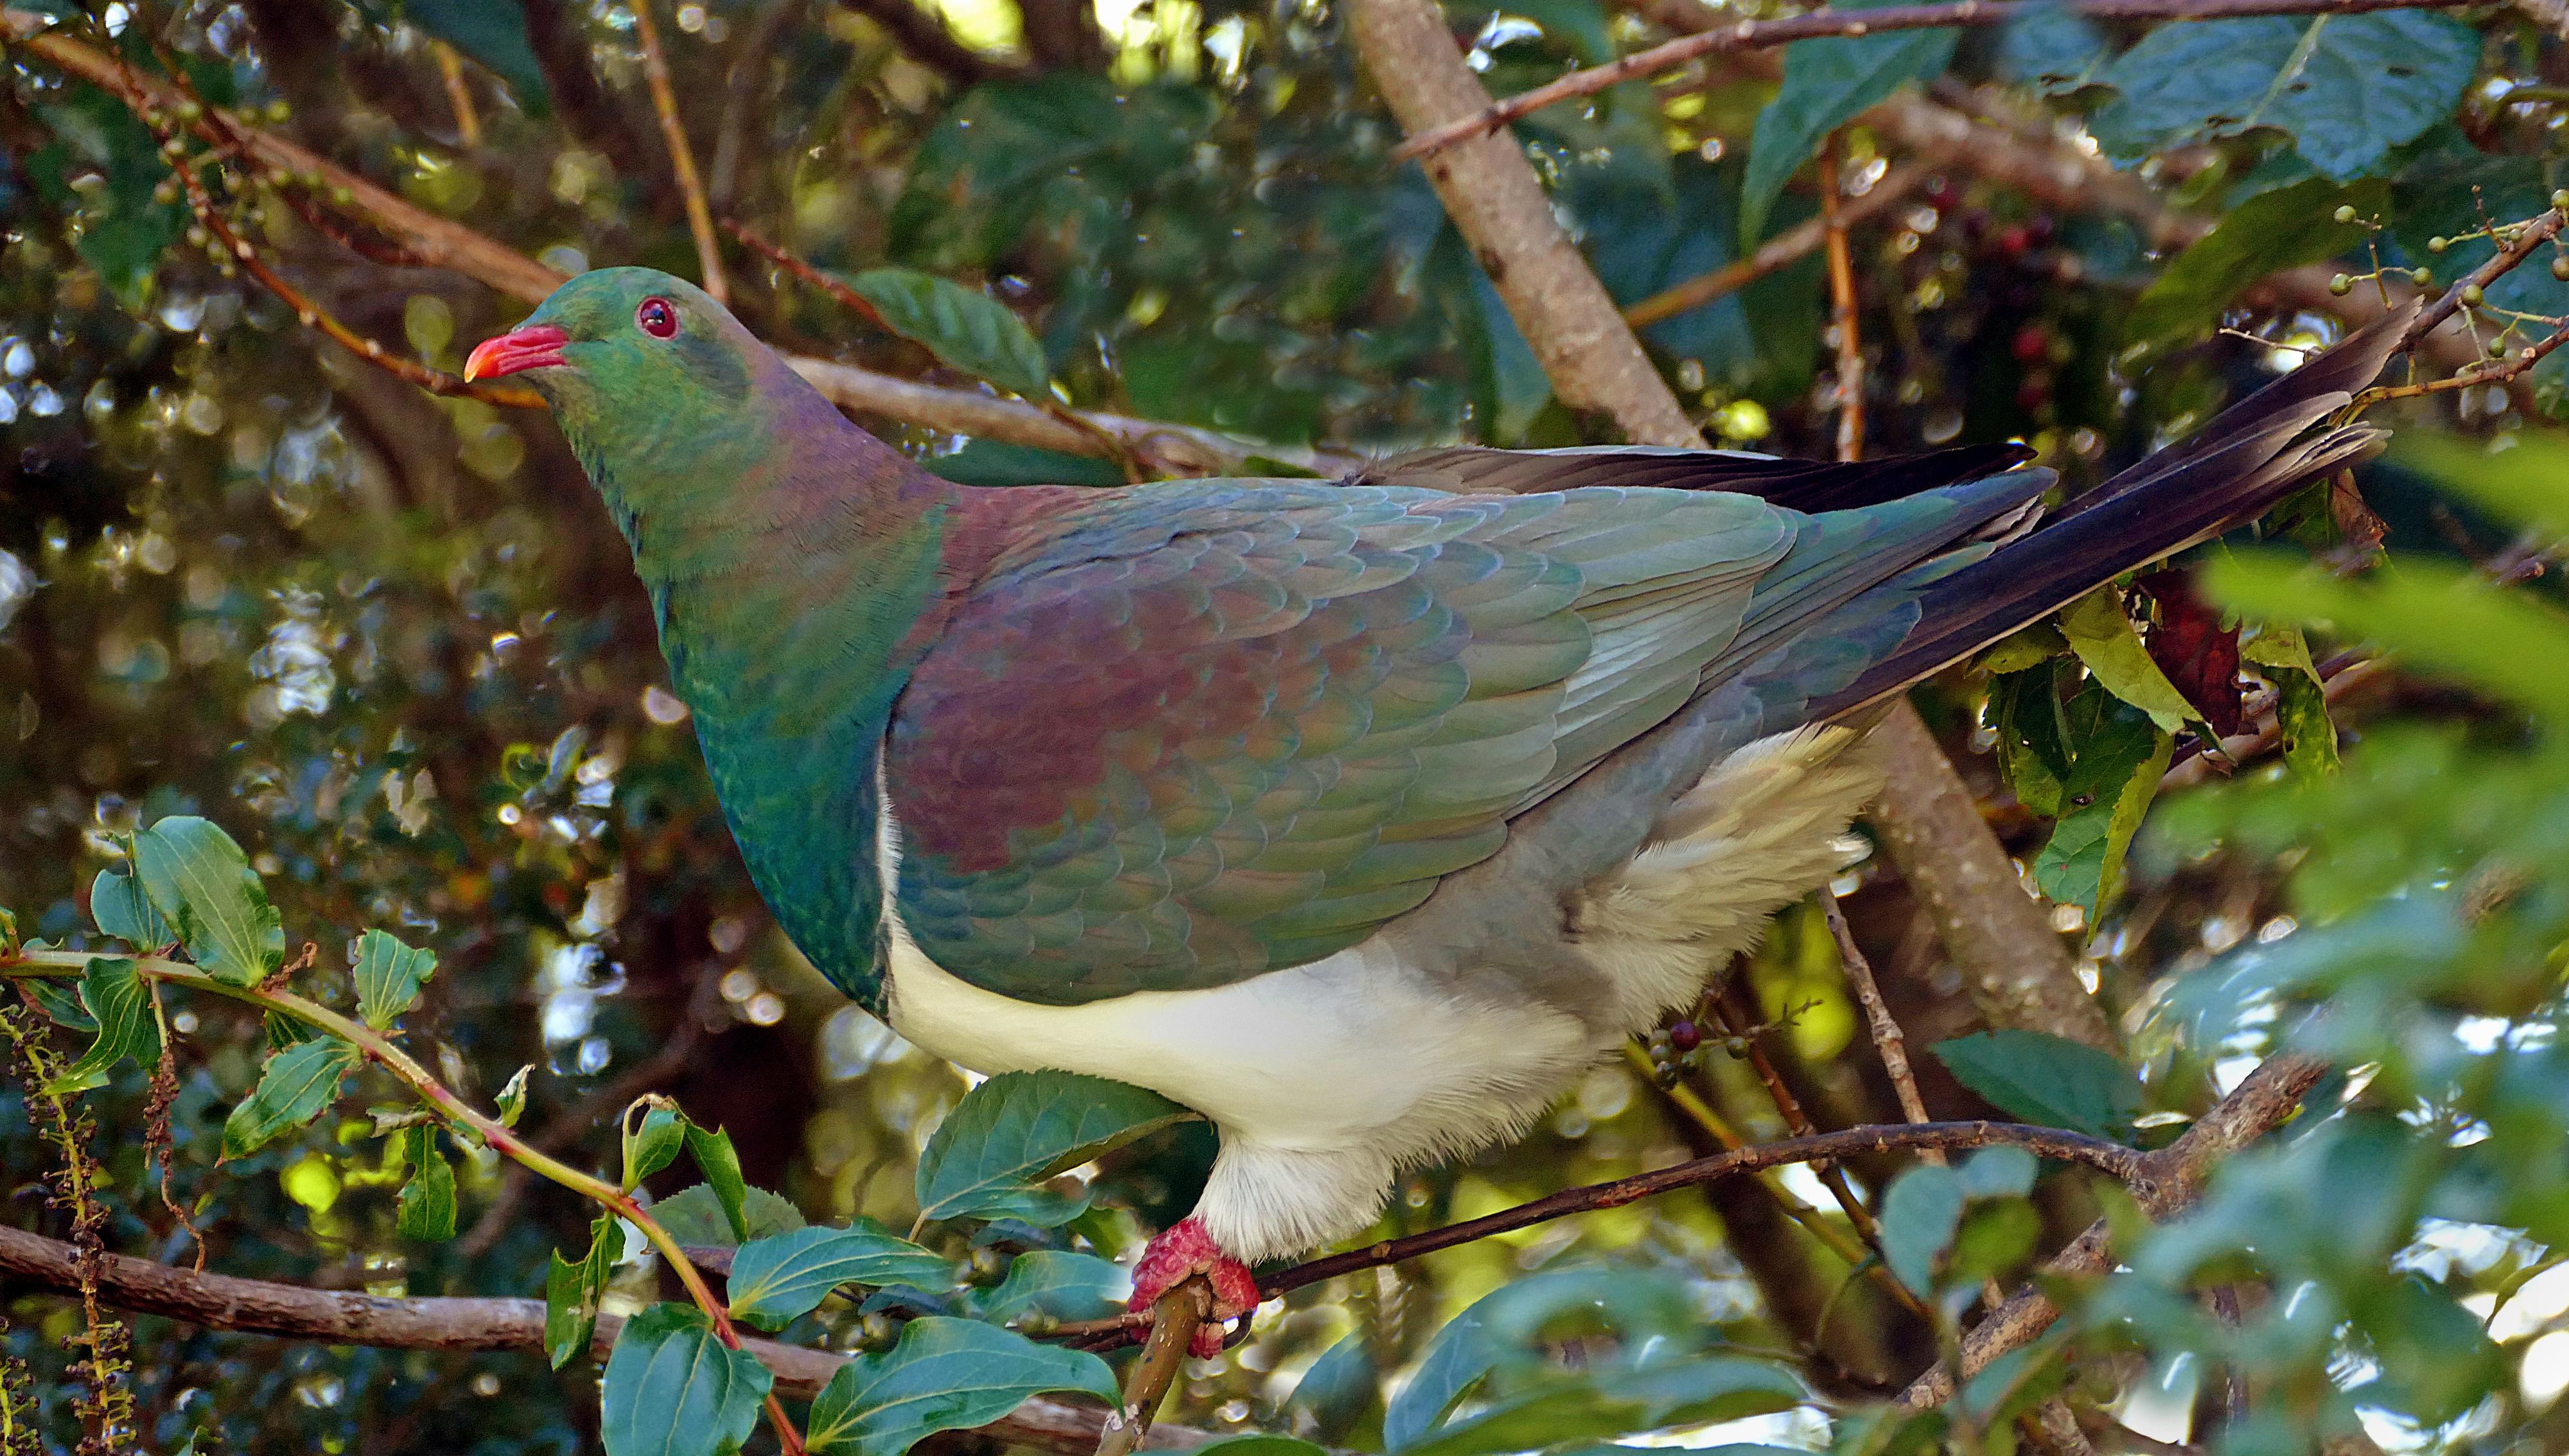 Kereru. nz wood pigeon. photo